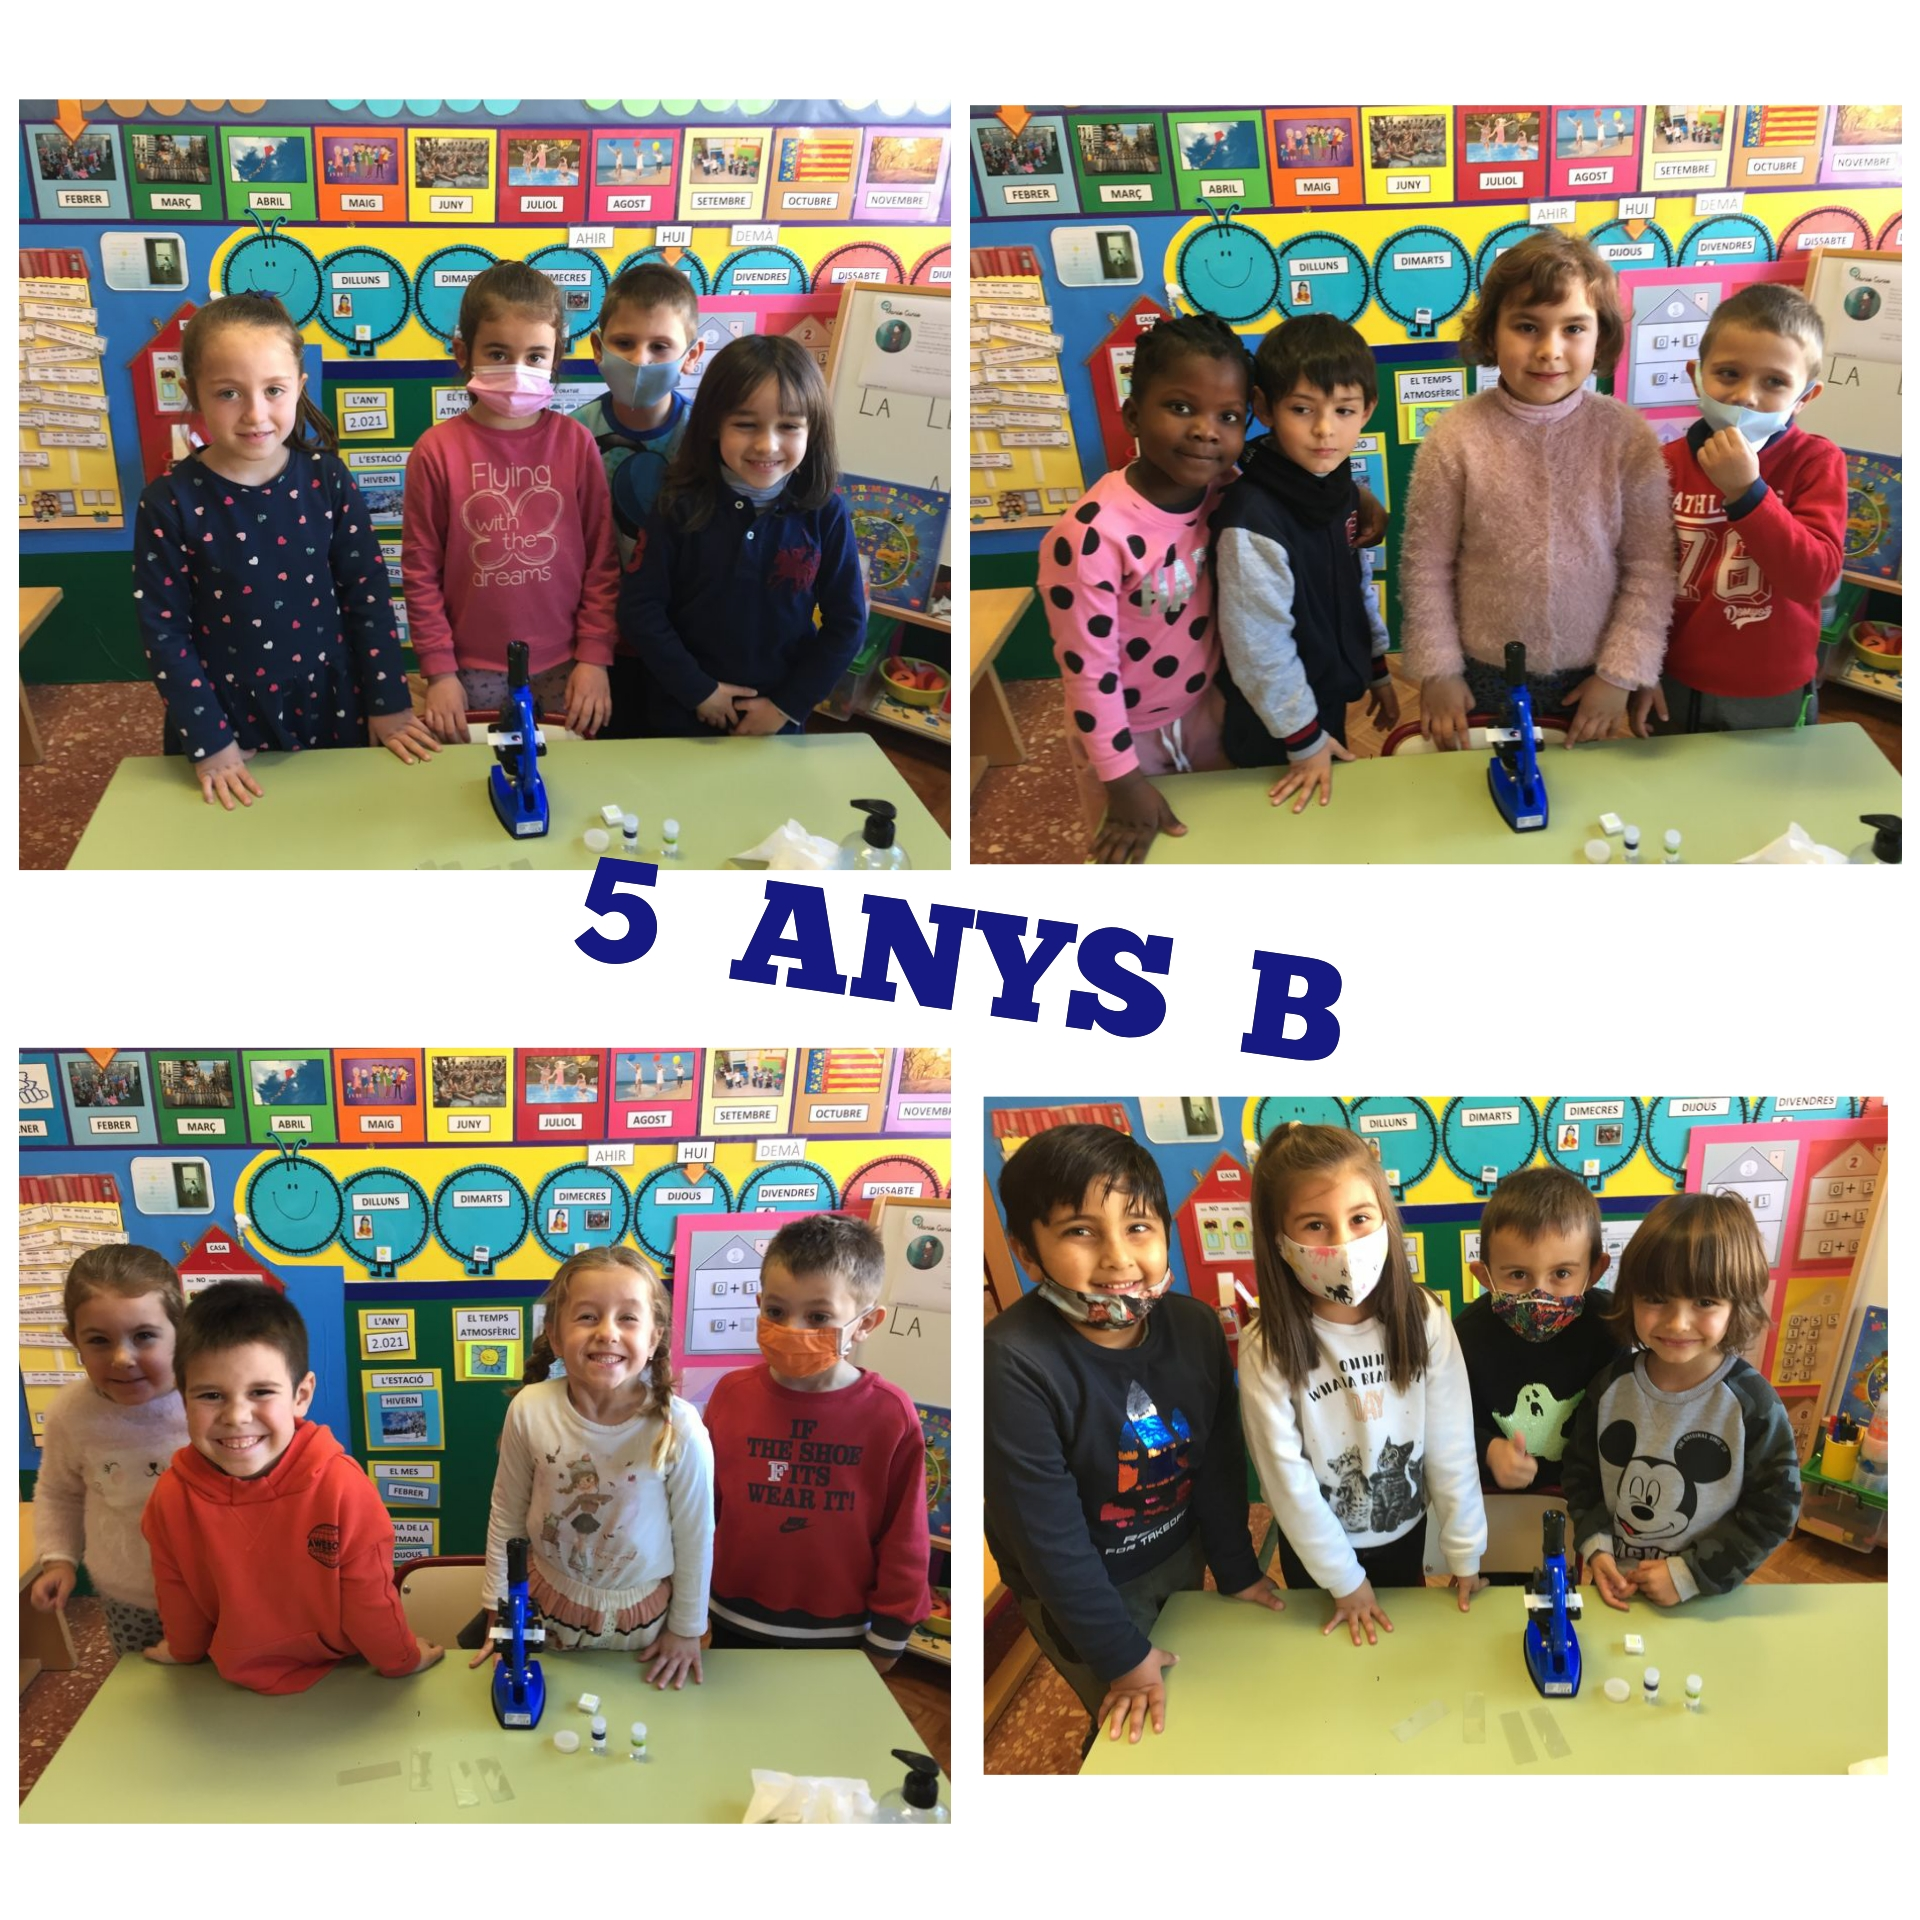 5-ANYS-B-2